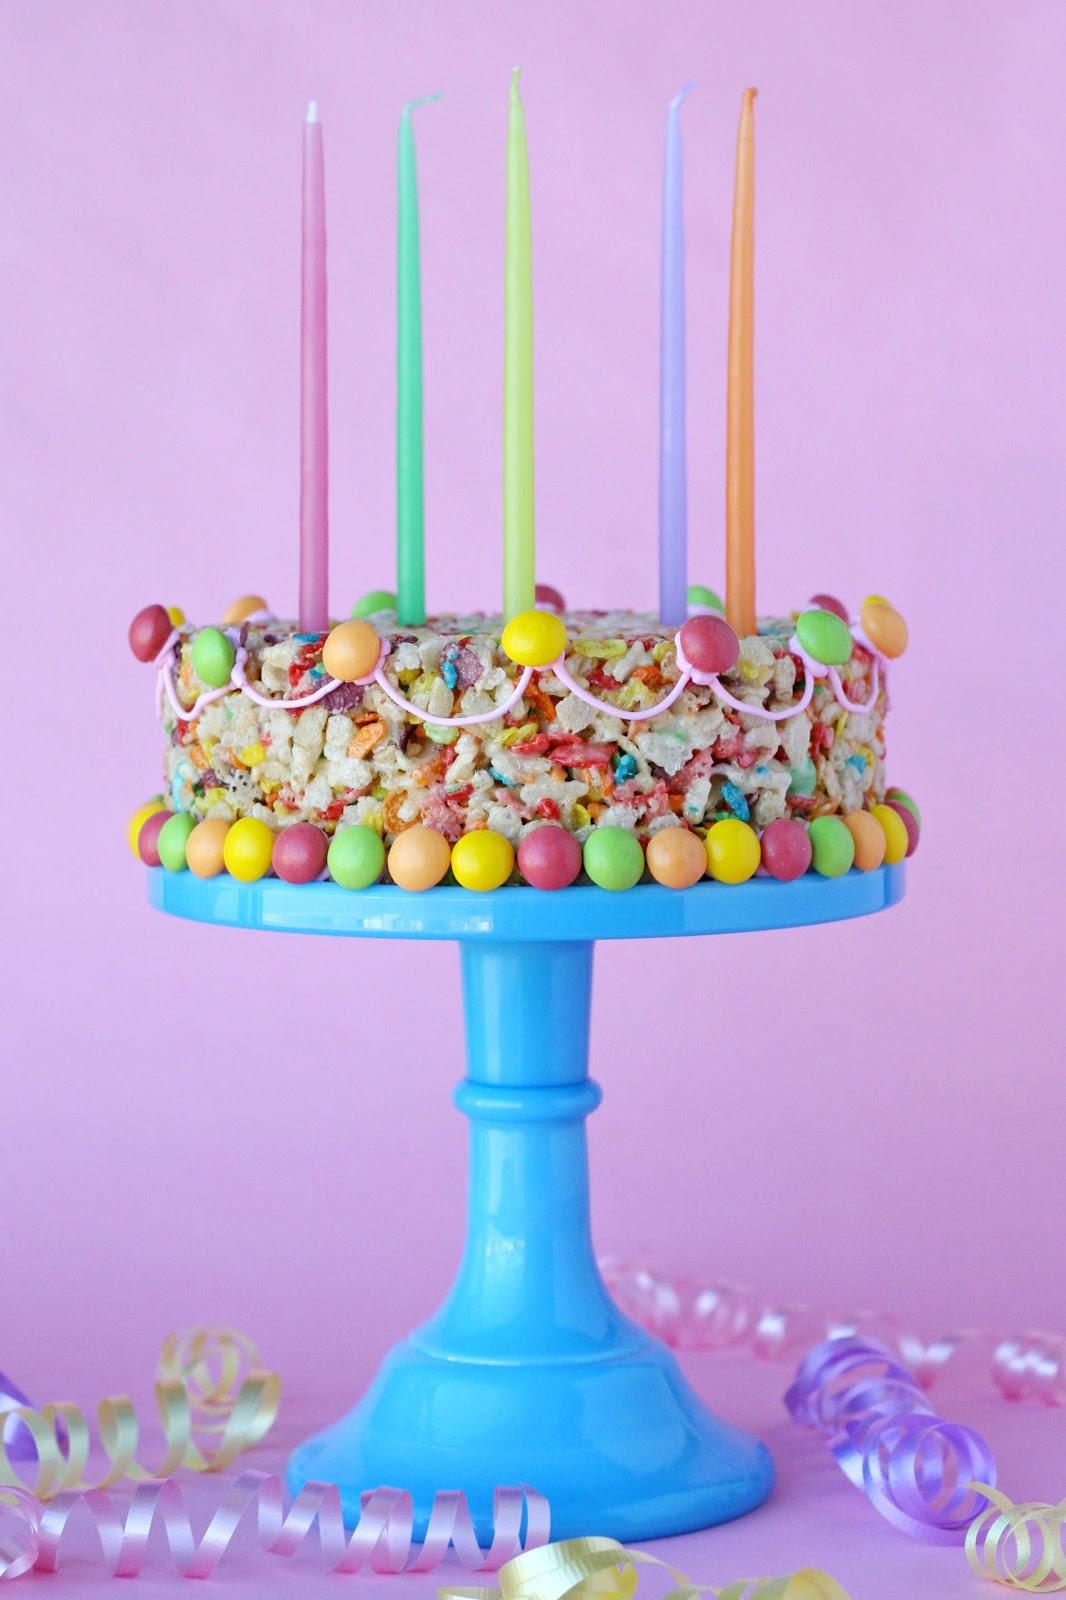 Outstanding Fruity Pebbles Treats Cake Glorious Treats Personalised Birthday Cards Sponlily Jamesorg